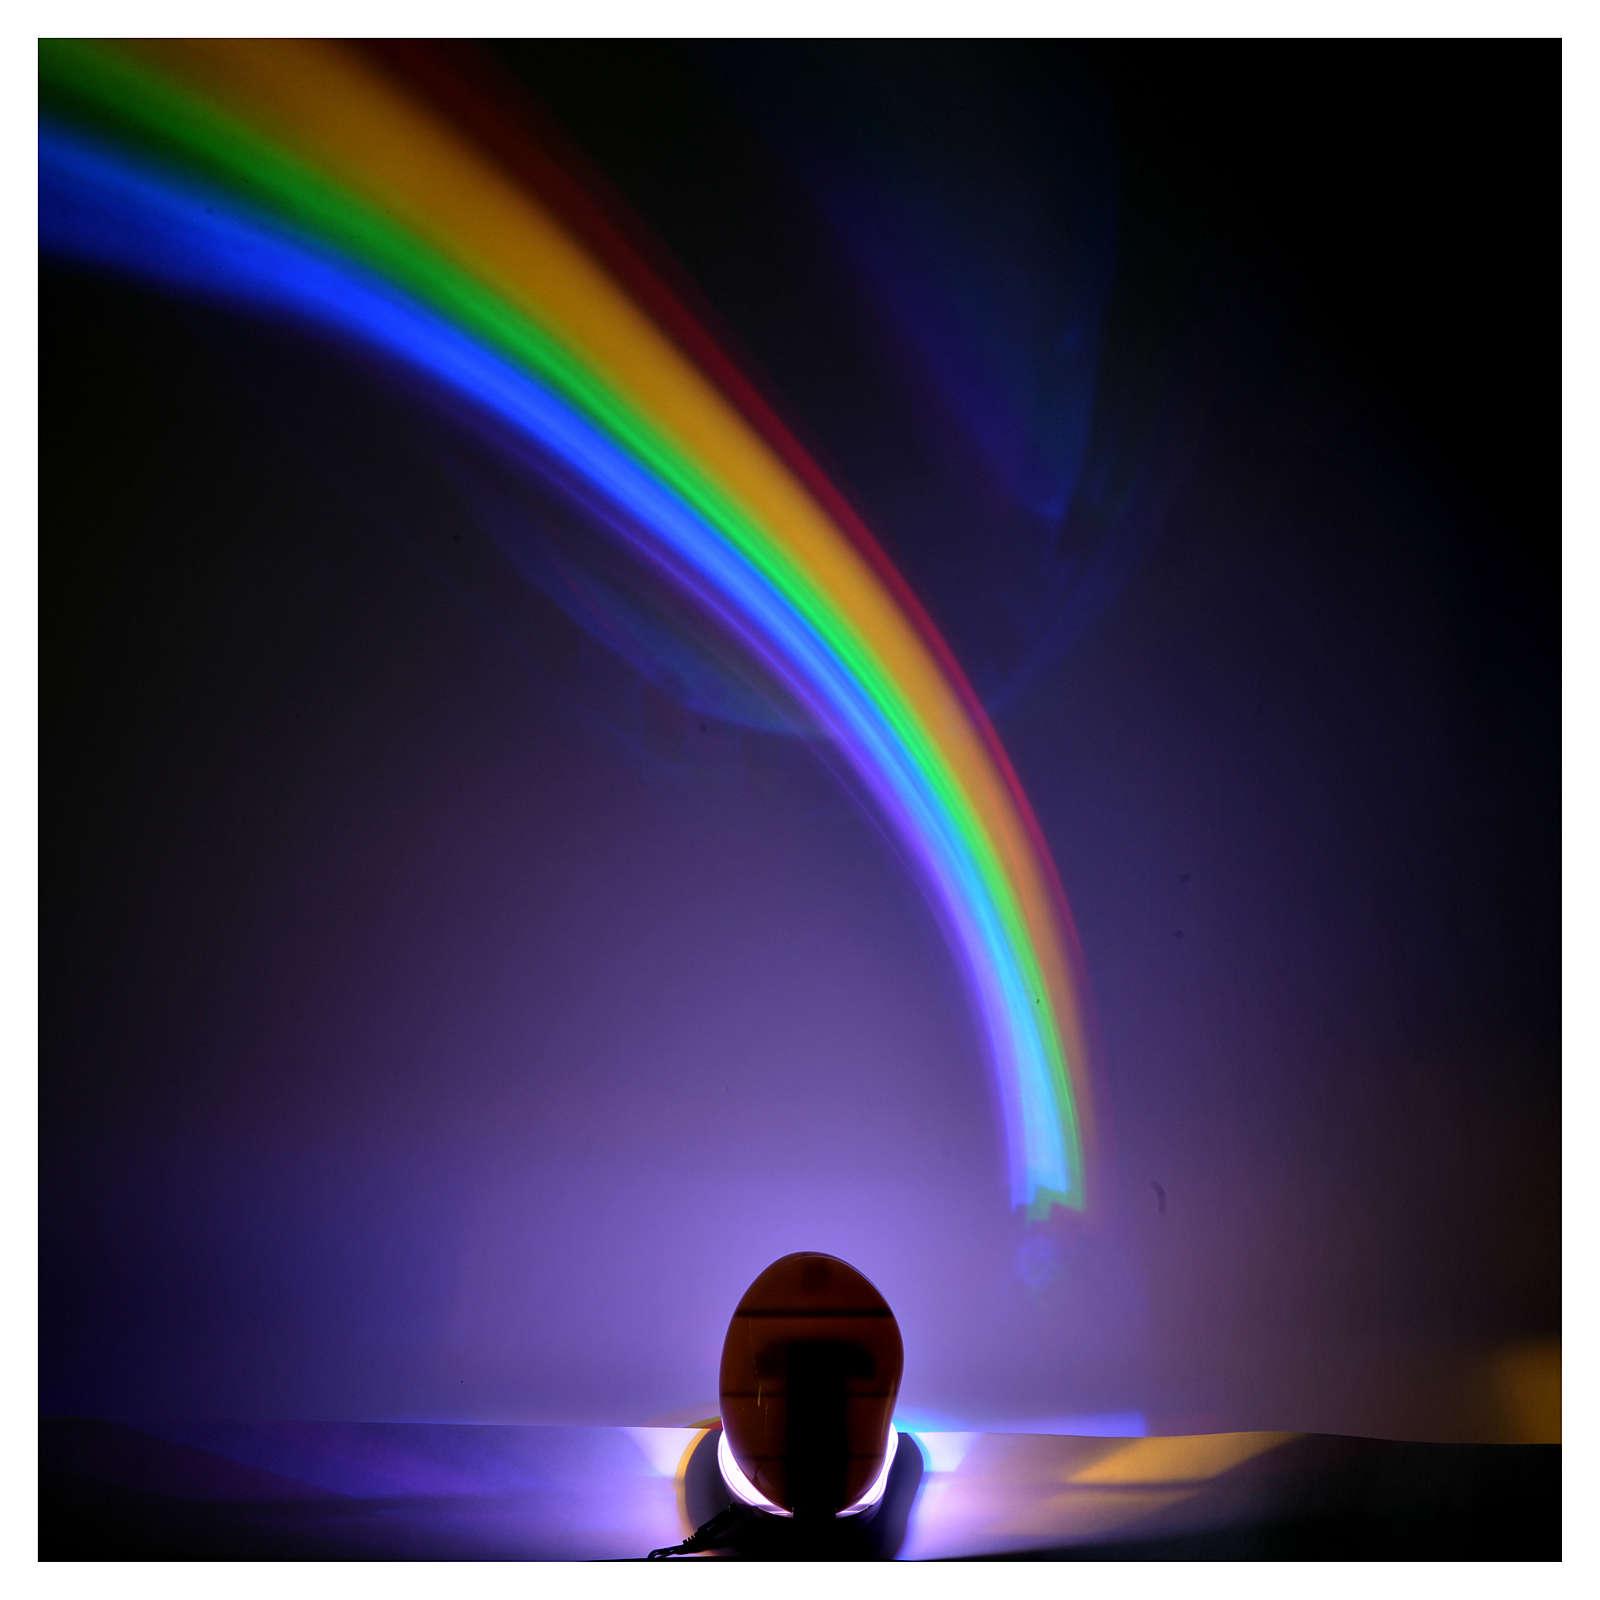 Nativity scene rainbow 4